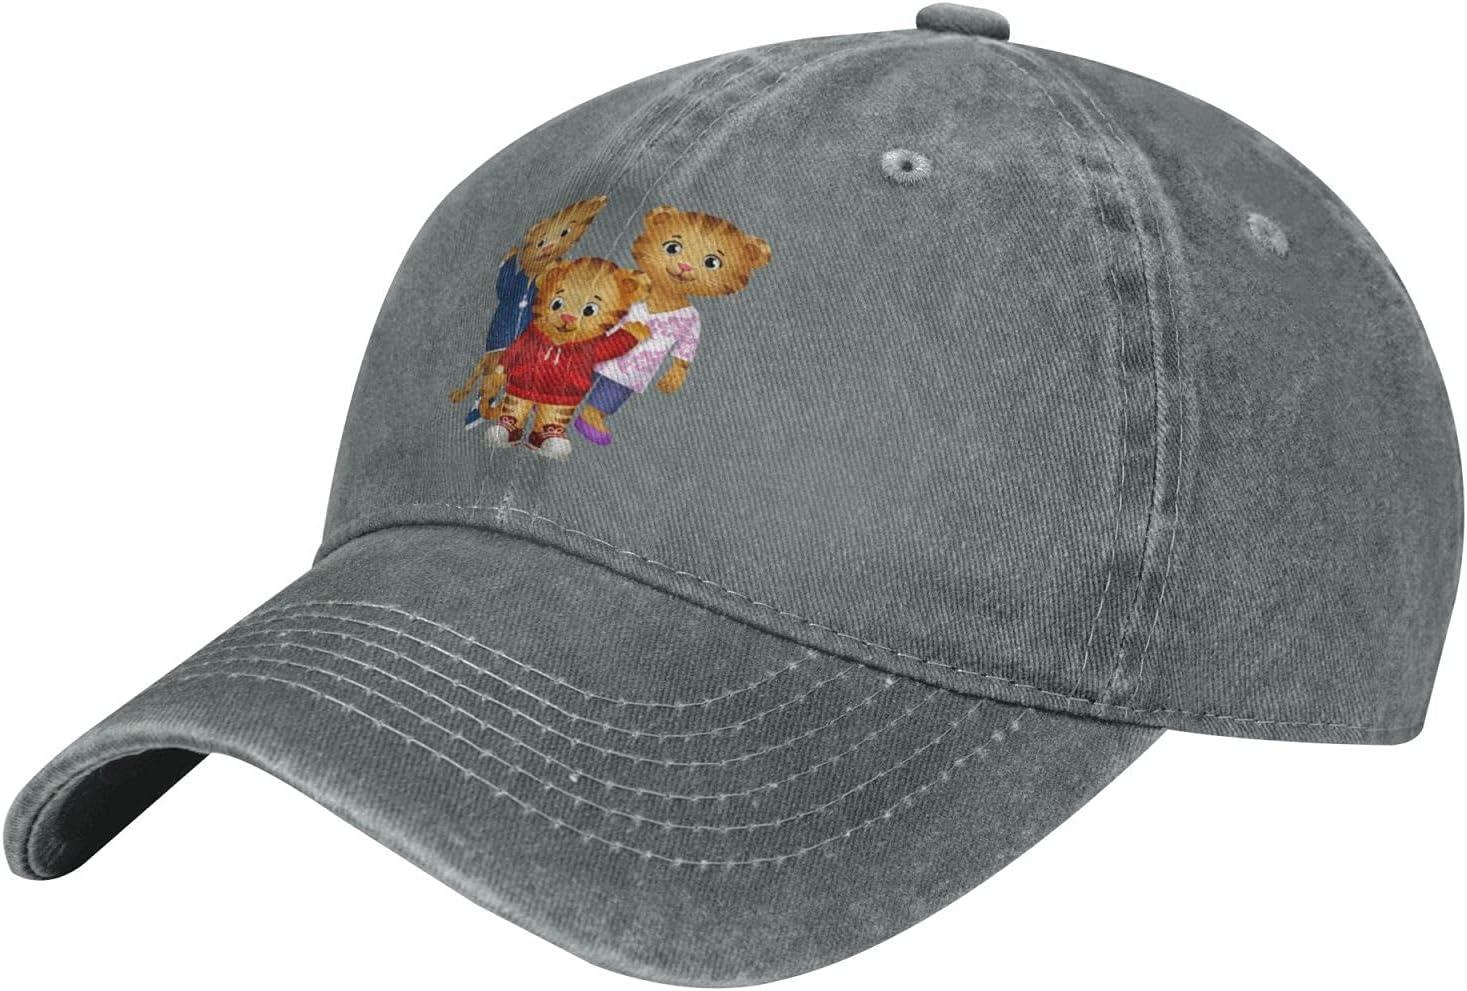 Pcaocmro Daniel Tiger's Neighborhood Cowboy Hat Unisex Adjustable Hat Circumference Size Pure Cotton Denim Wash Water Outdoor